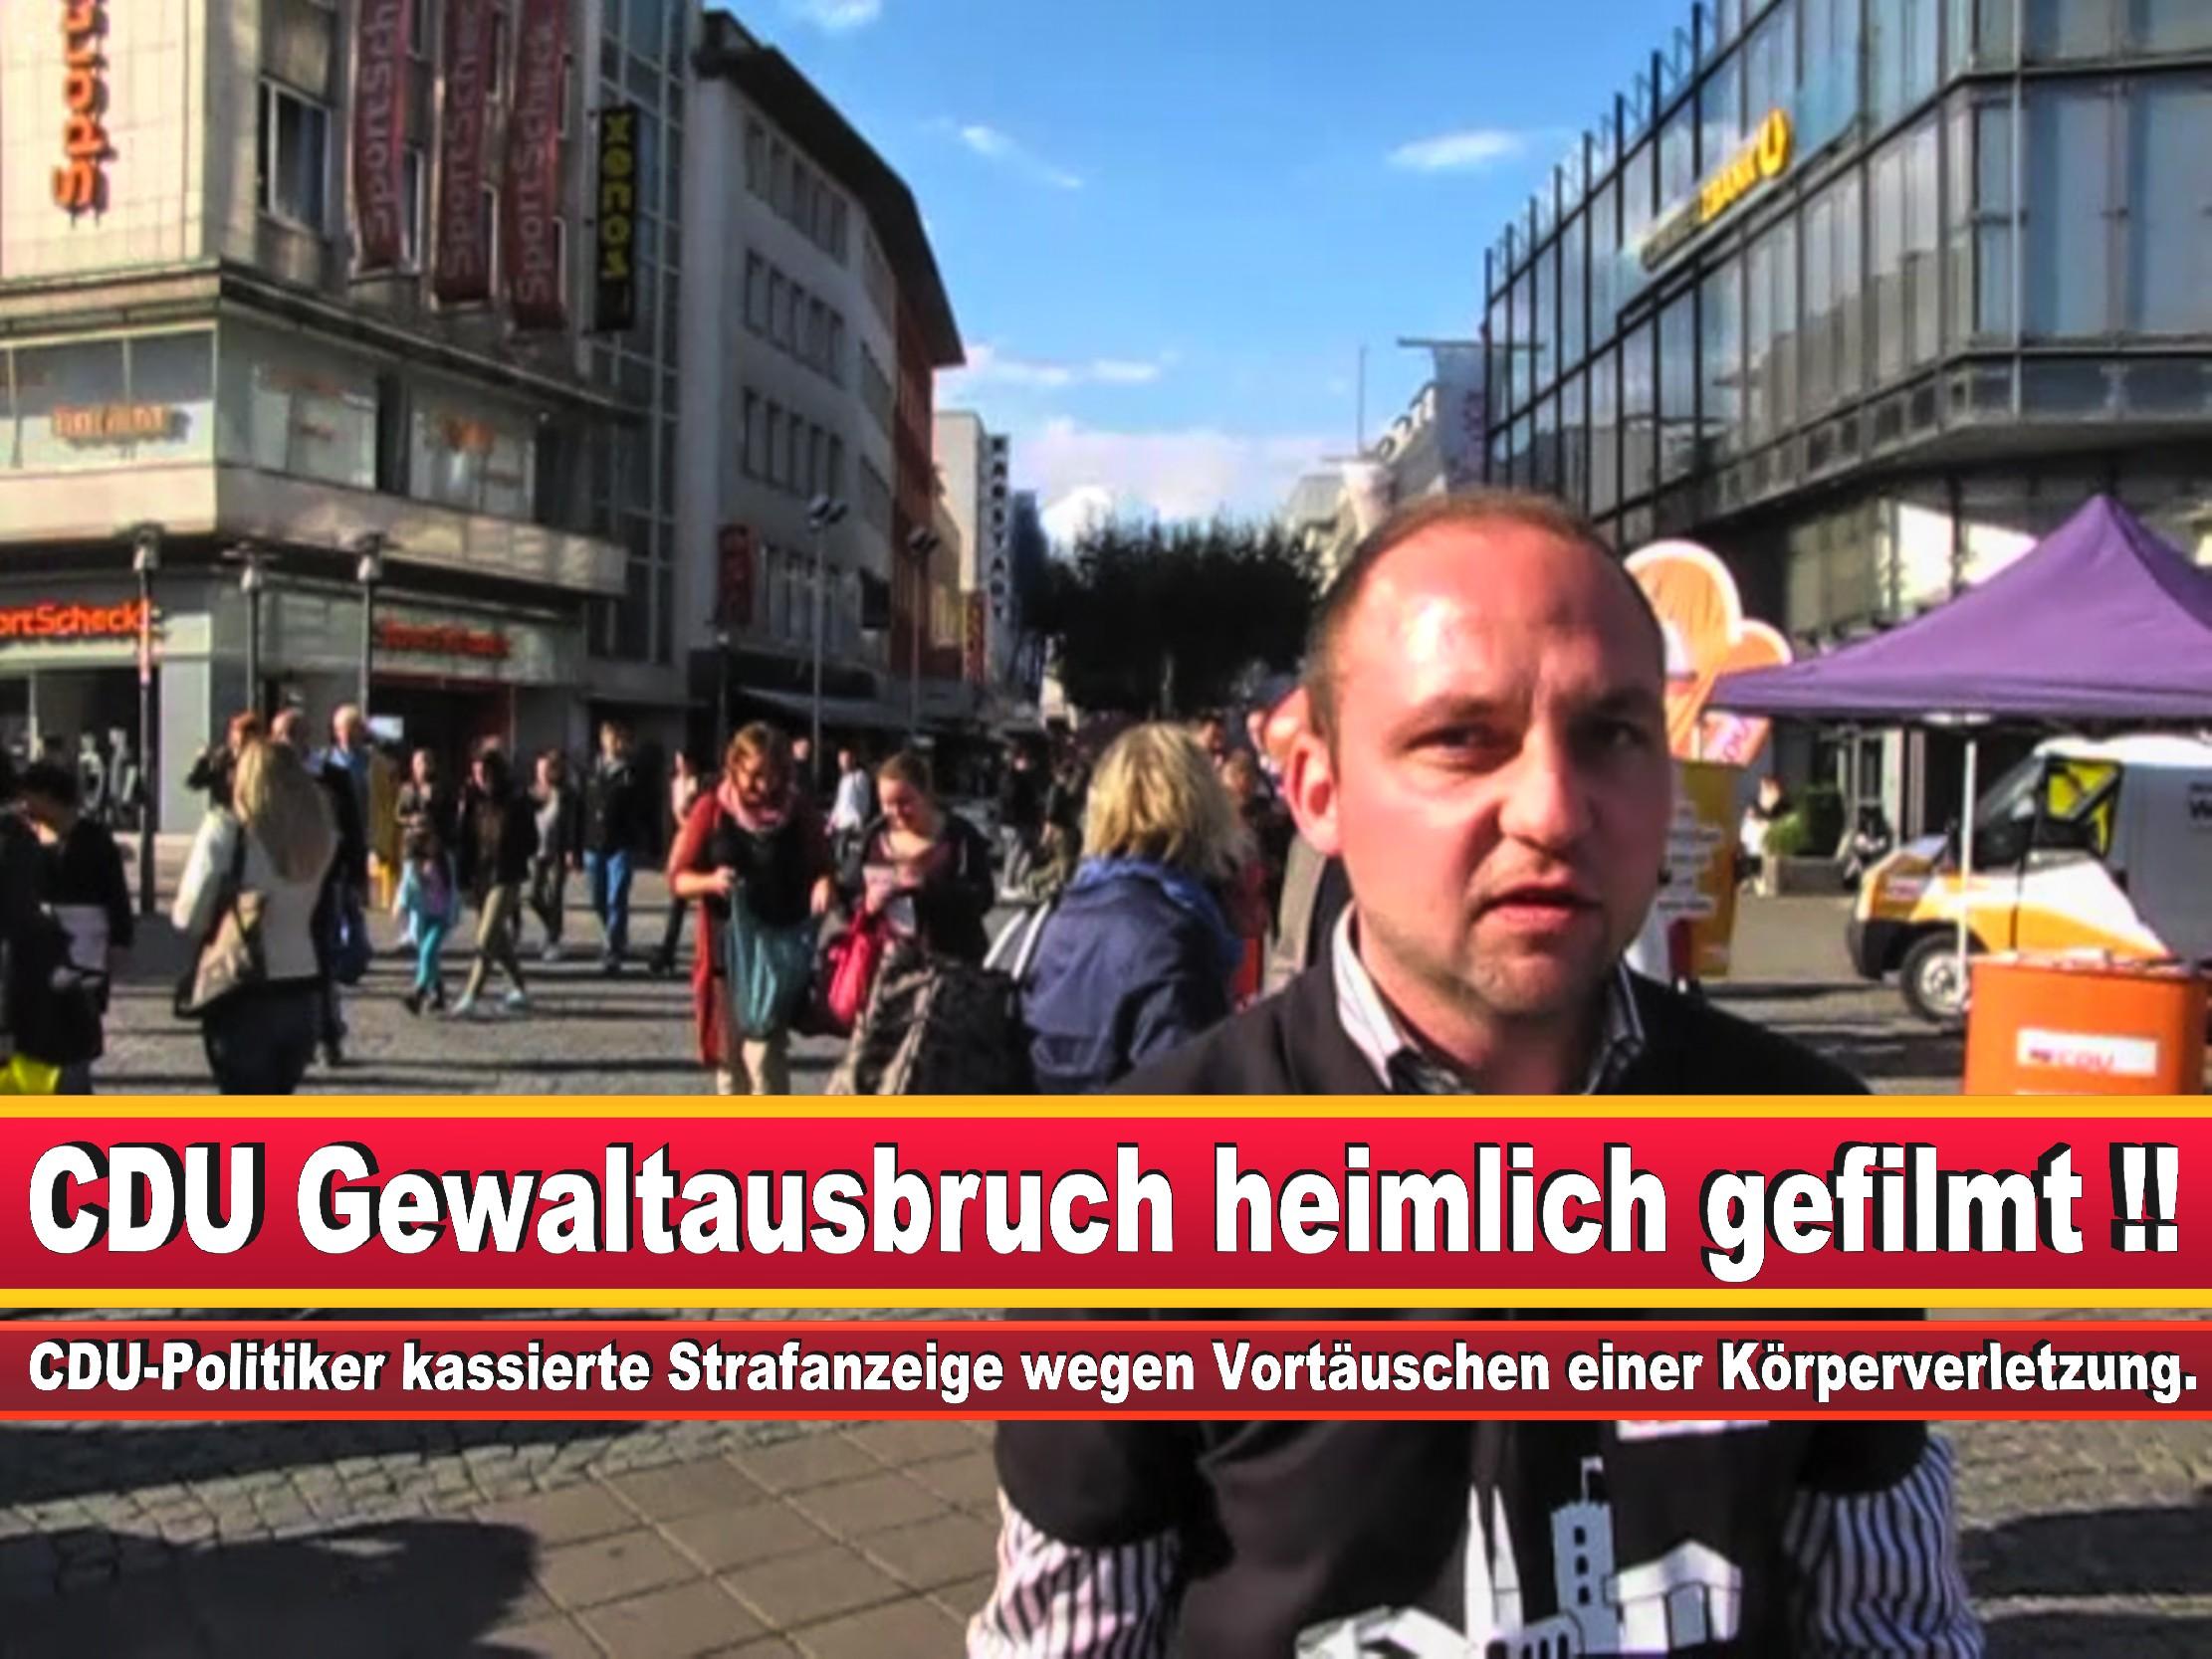 WESTFALEN BLATT BüCHER